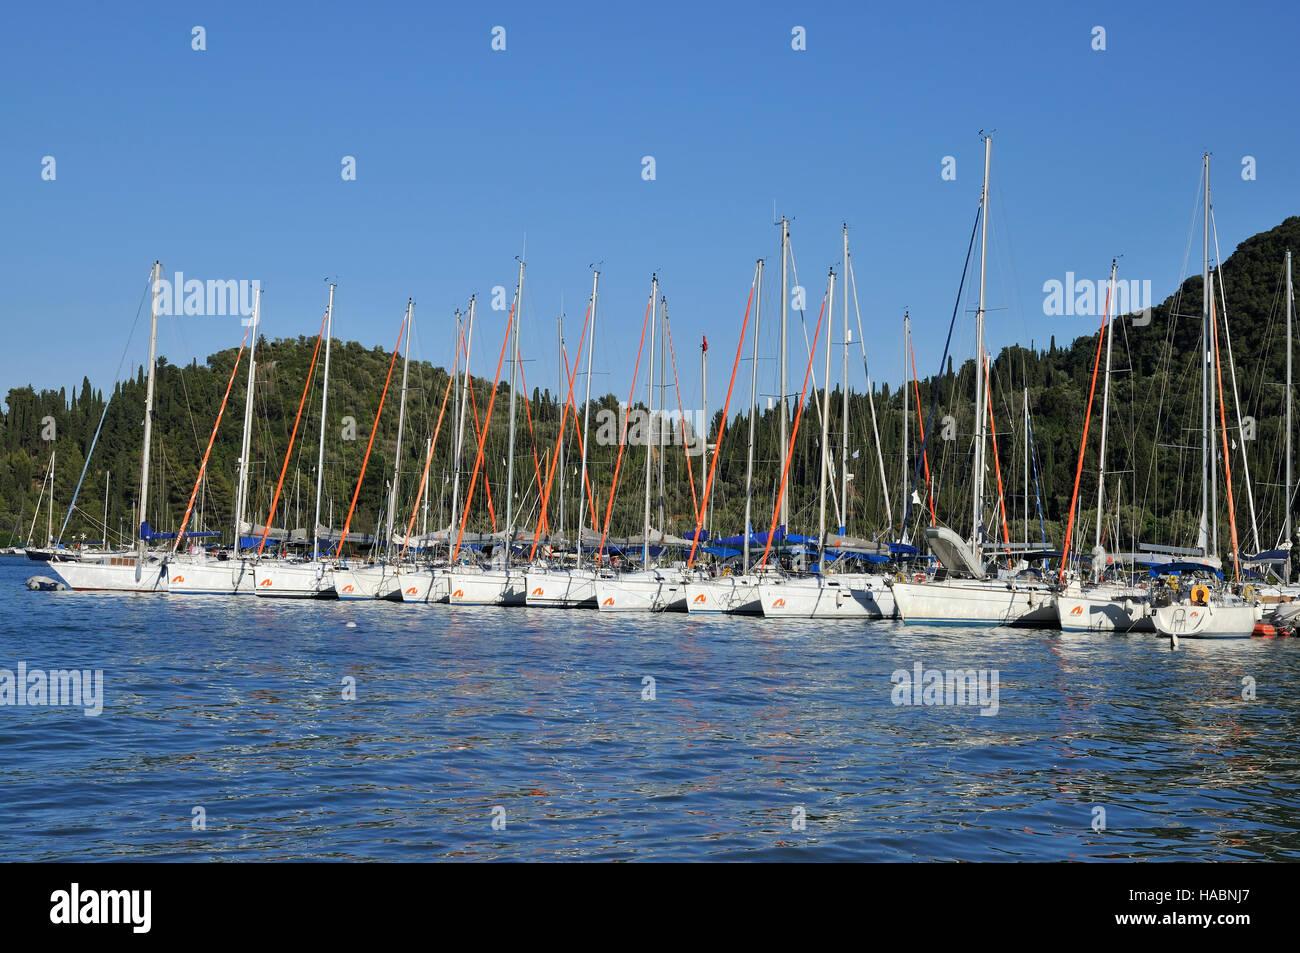 Sailing yachts in Nydri town, Lefkada island, Greece - Stock Image